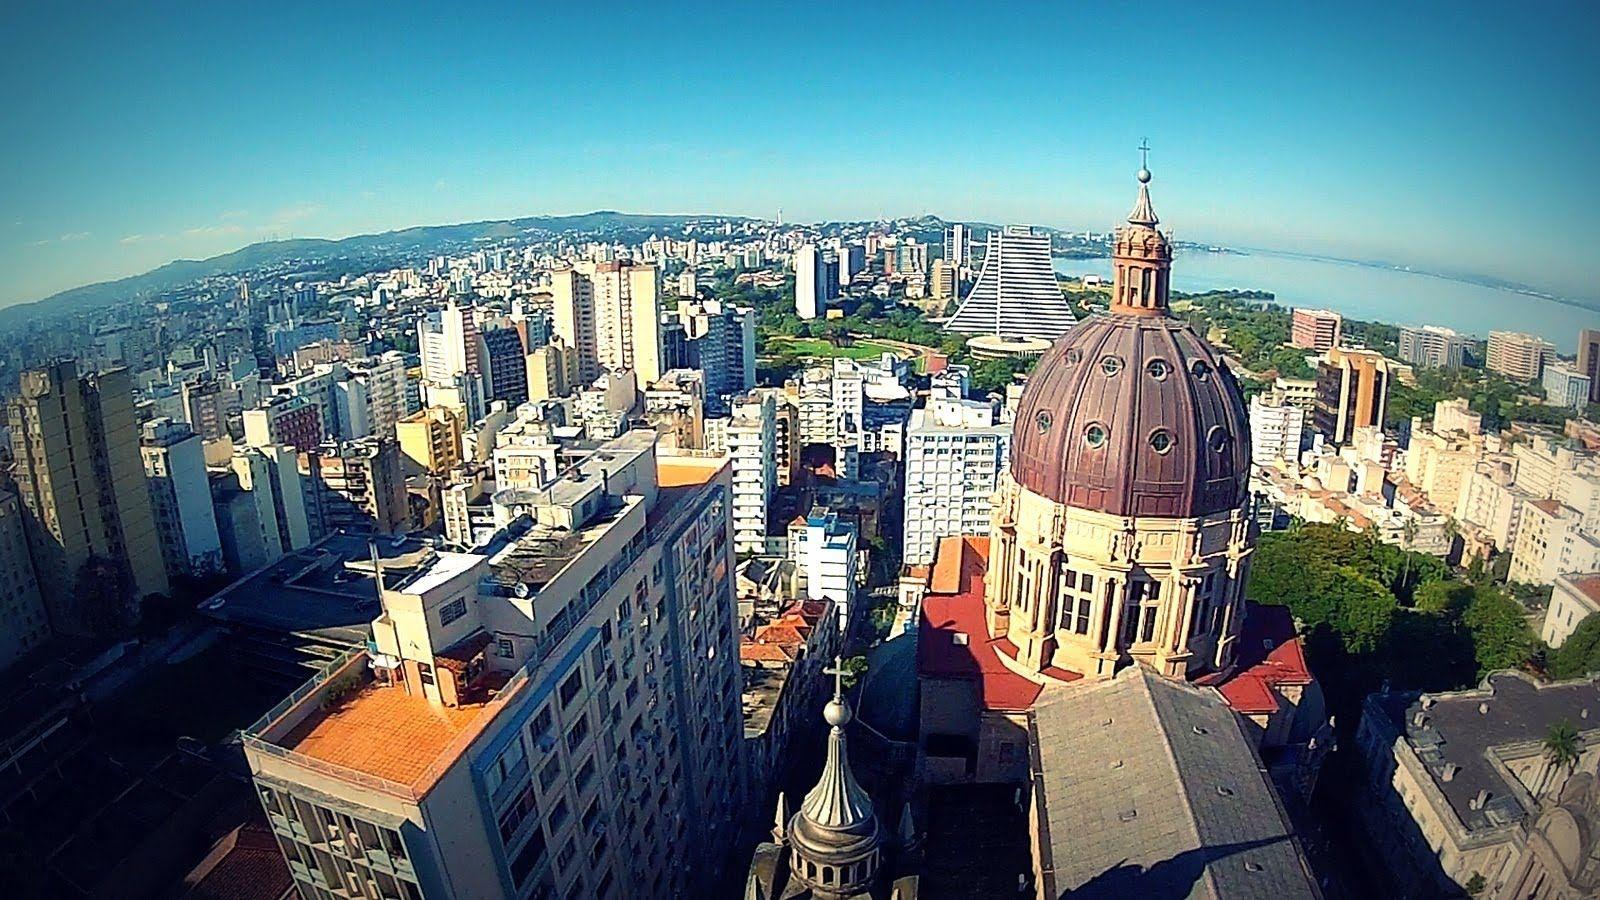 Filmagem Aerea Porto Alegre Rs Porto Alegre Brasil Cidade De Porto Alegre